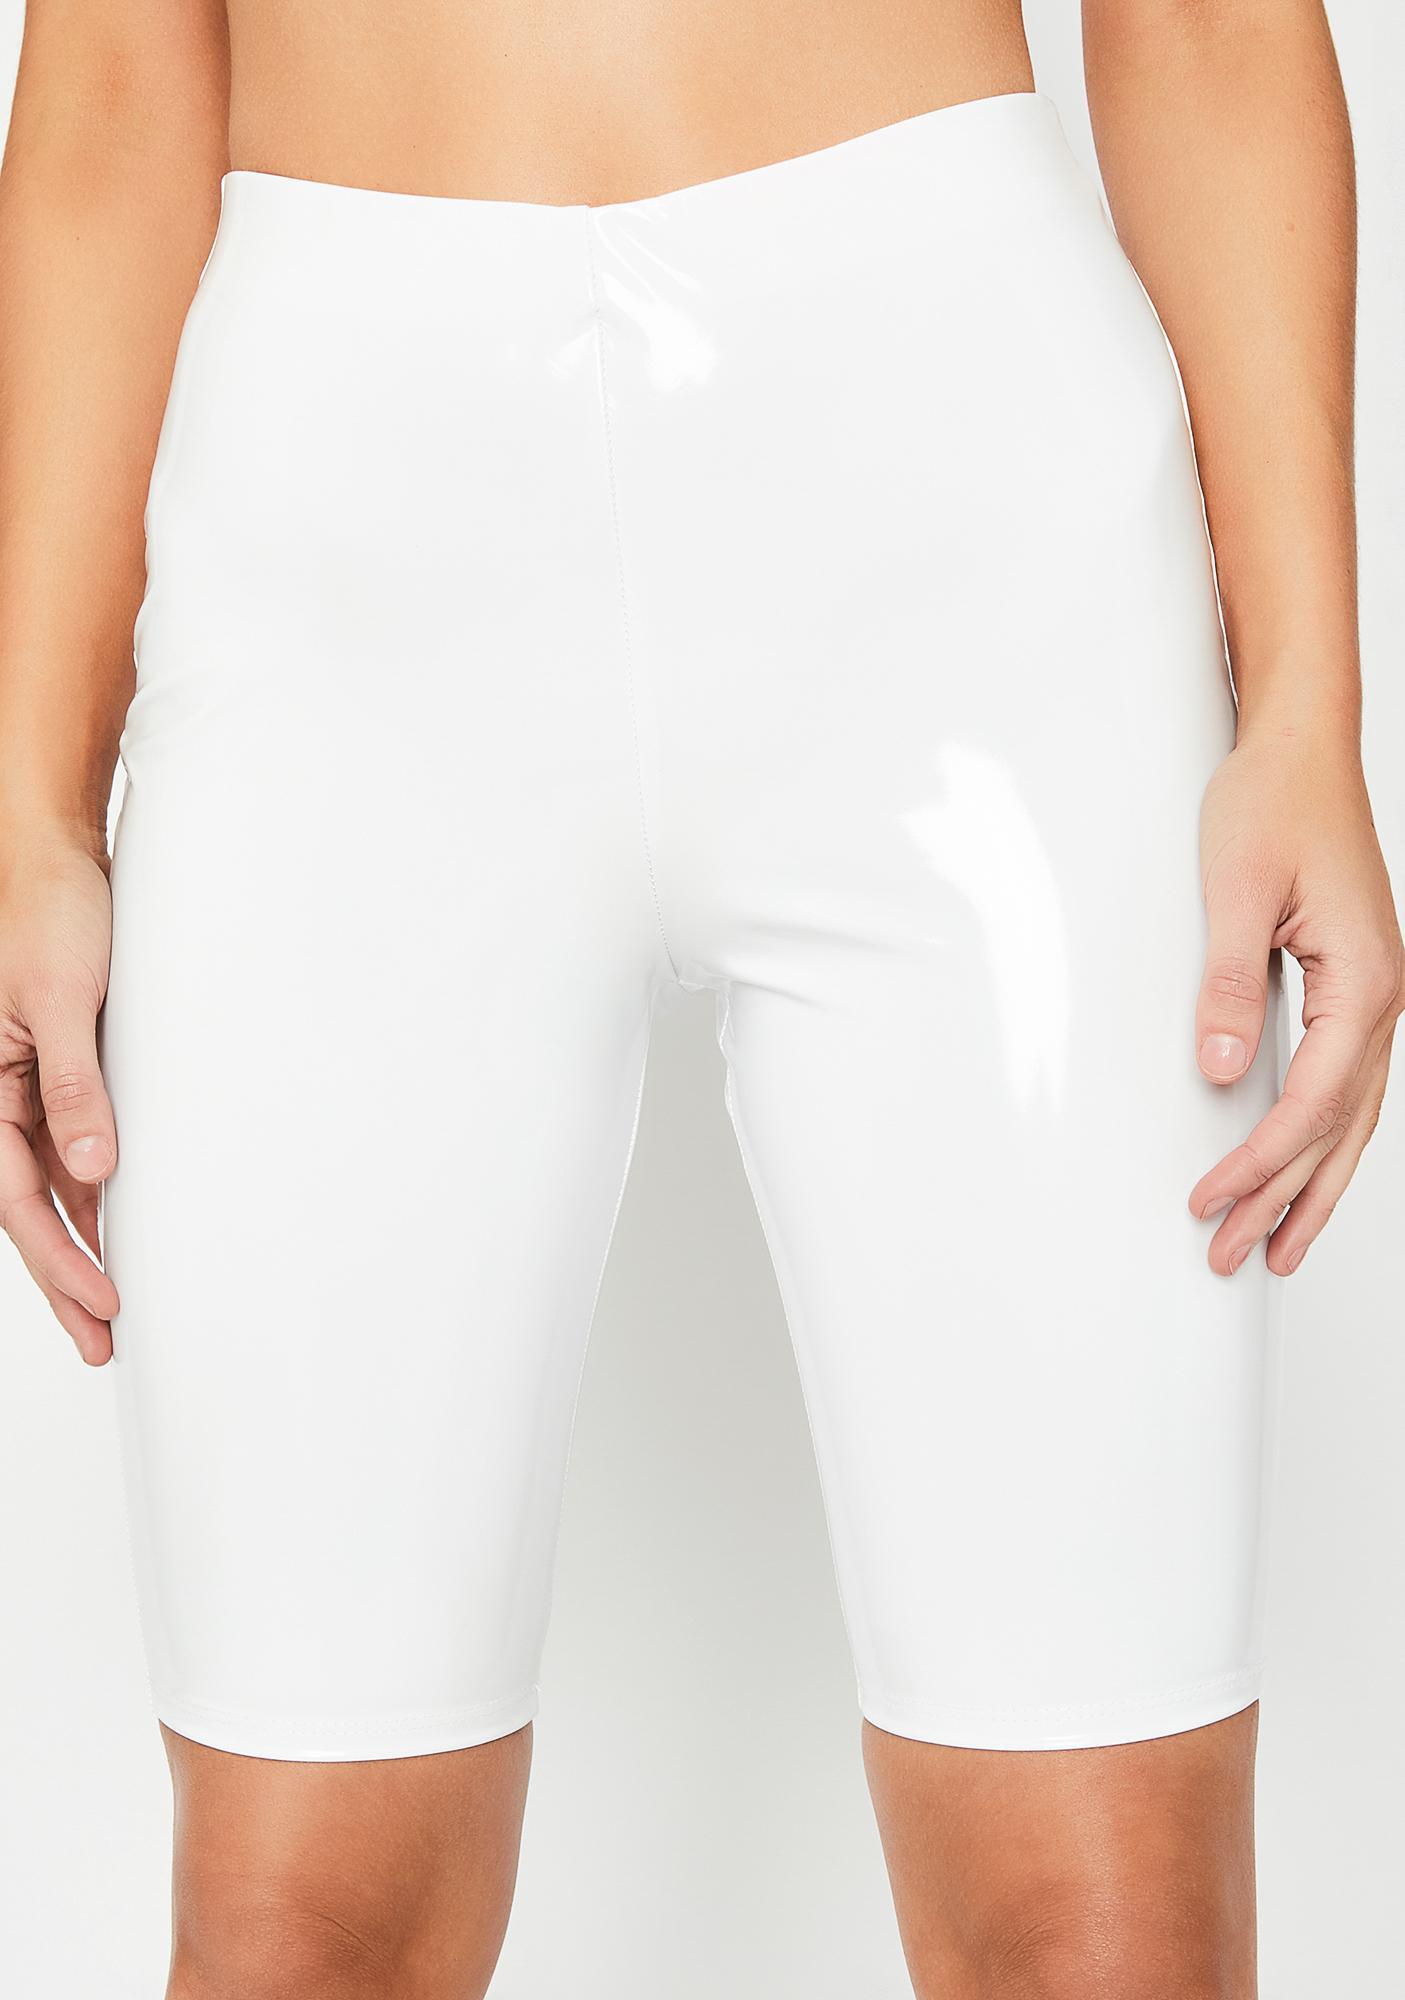 Icy Savage Rampage PVC Shorts